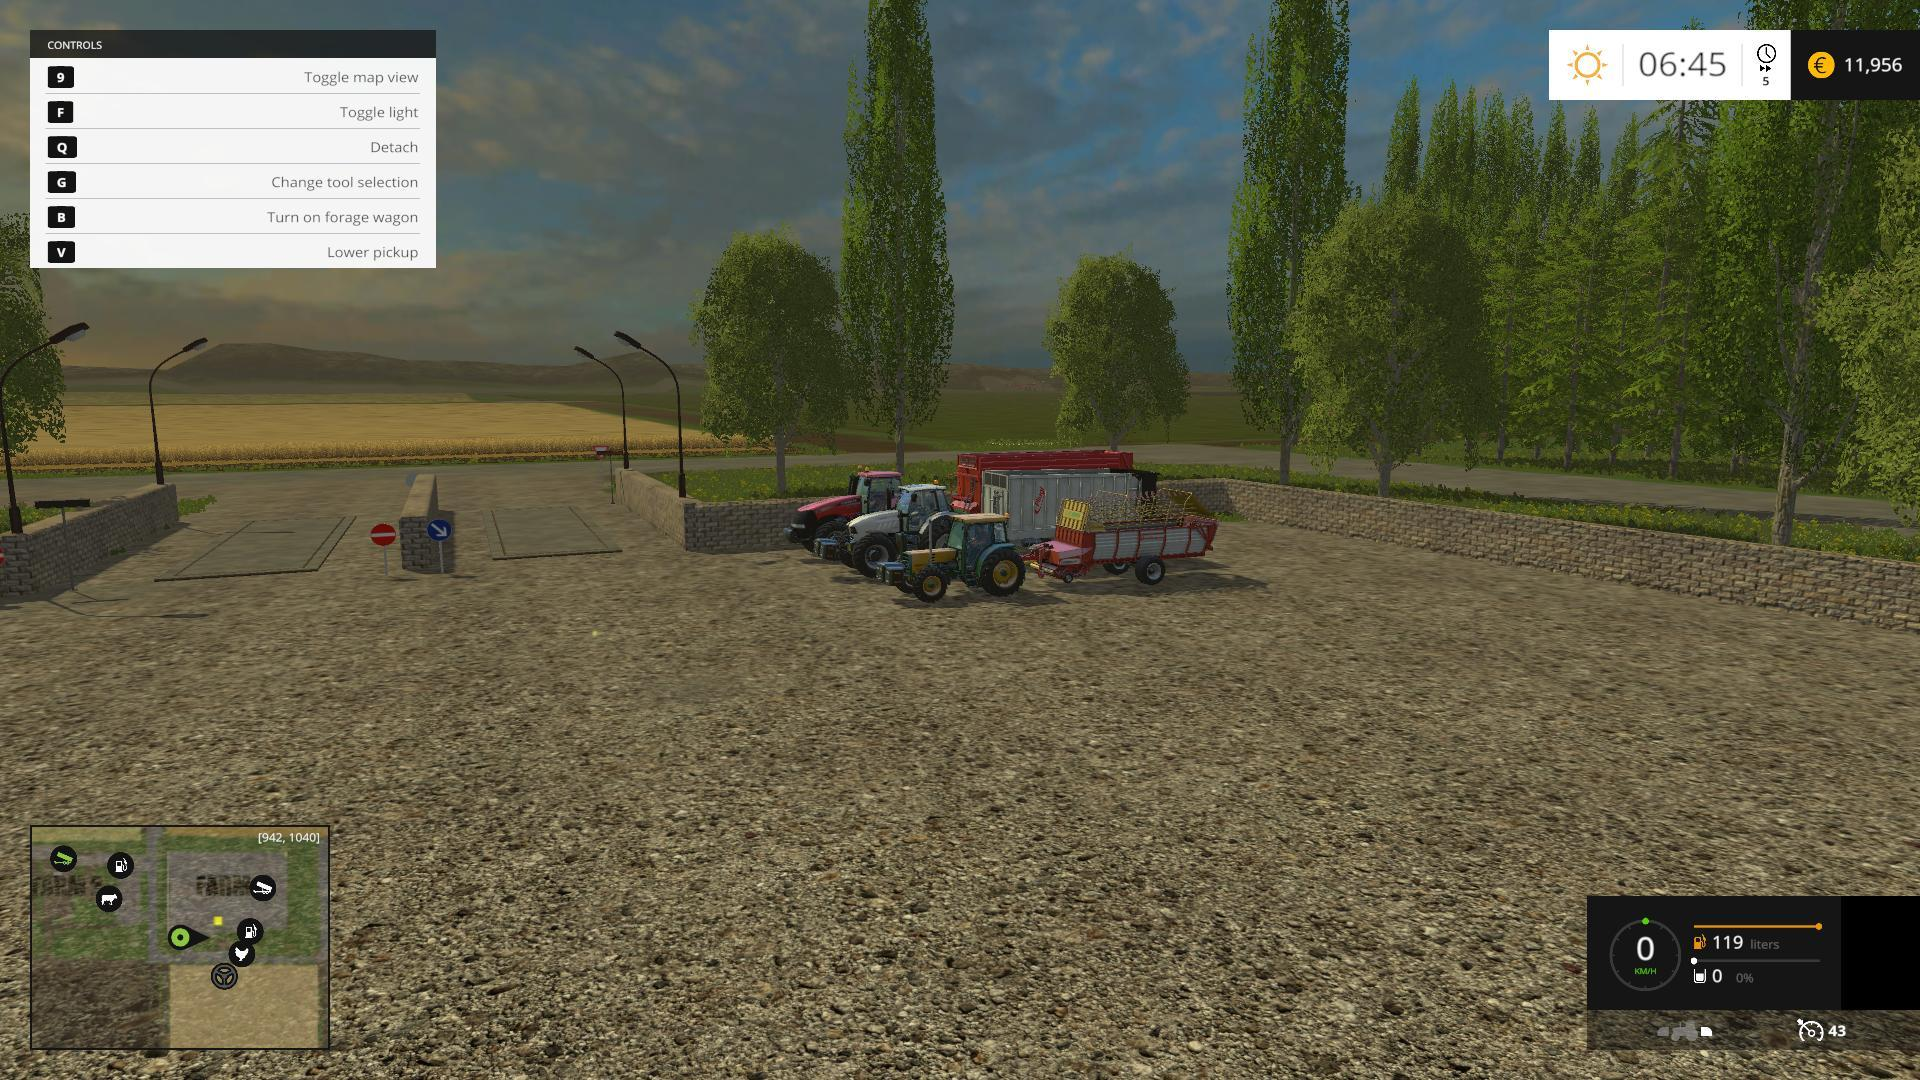 HOBBS FARM MAP V25 FS 2015 Farming simulator 2019 2017 2015 Mod